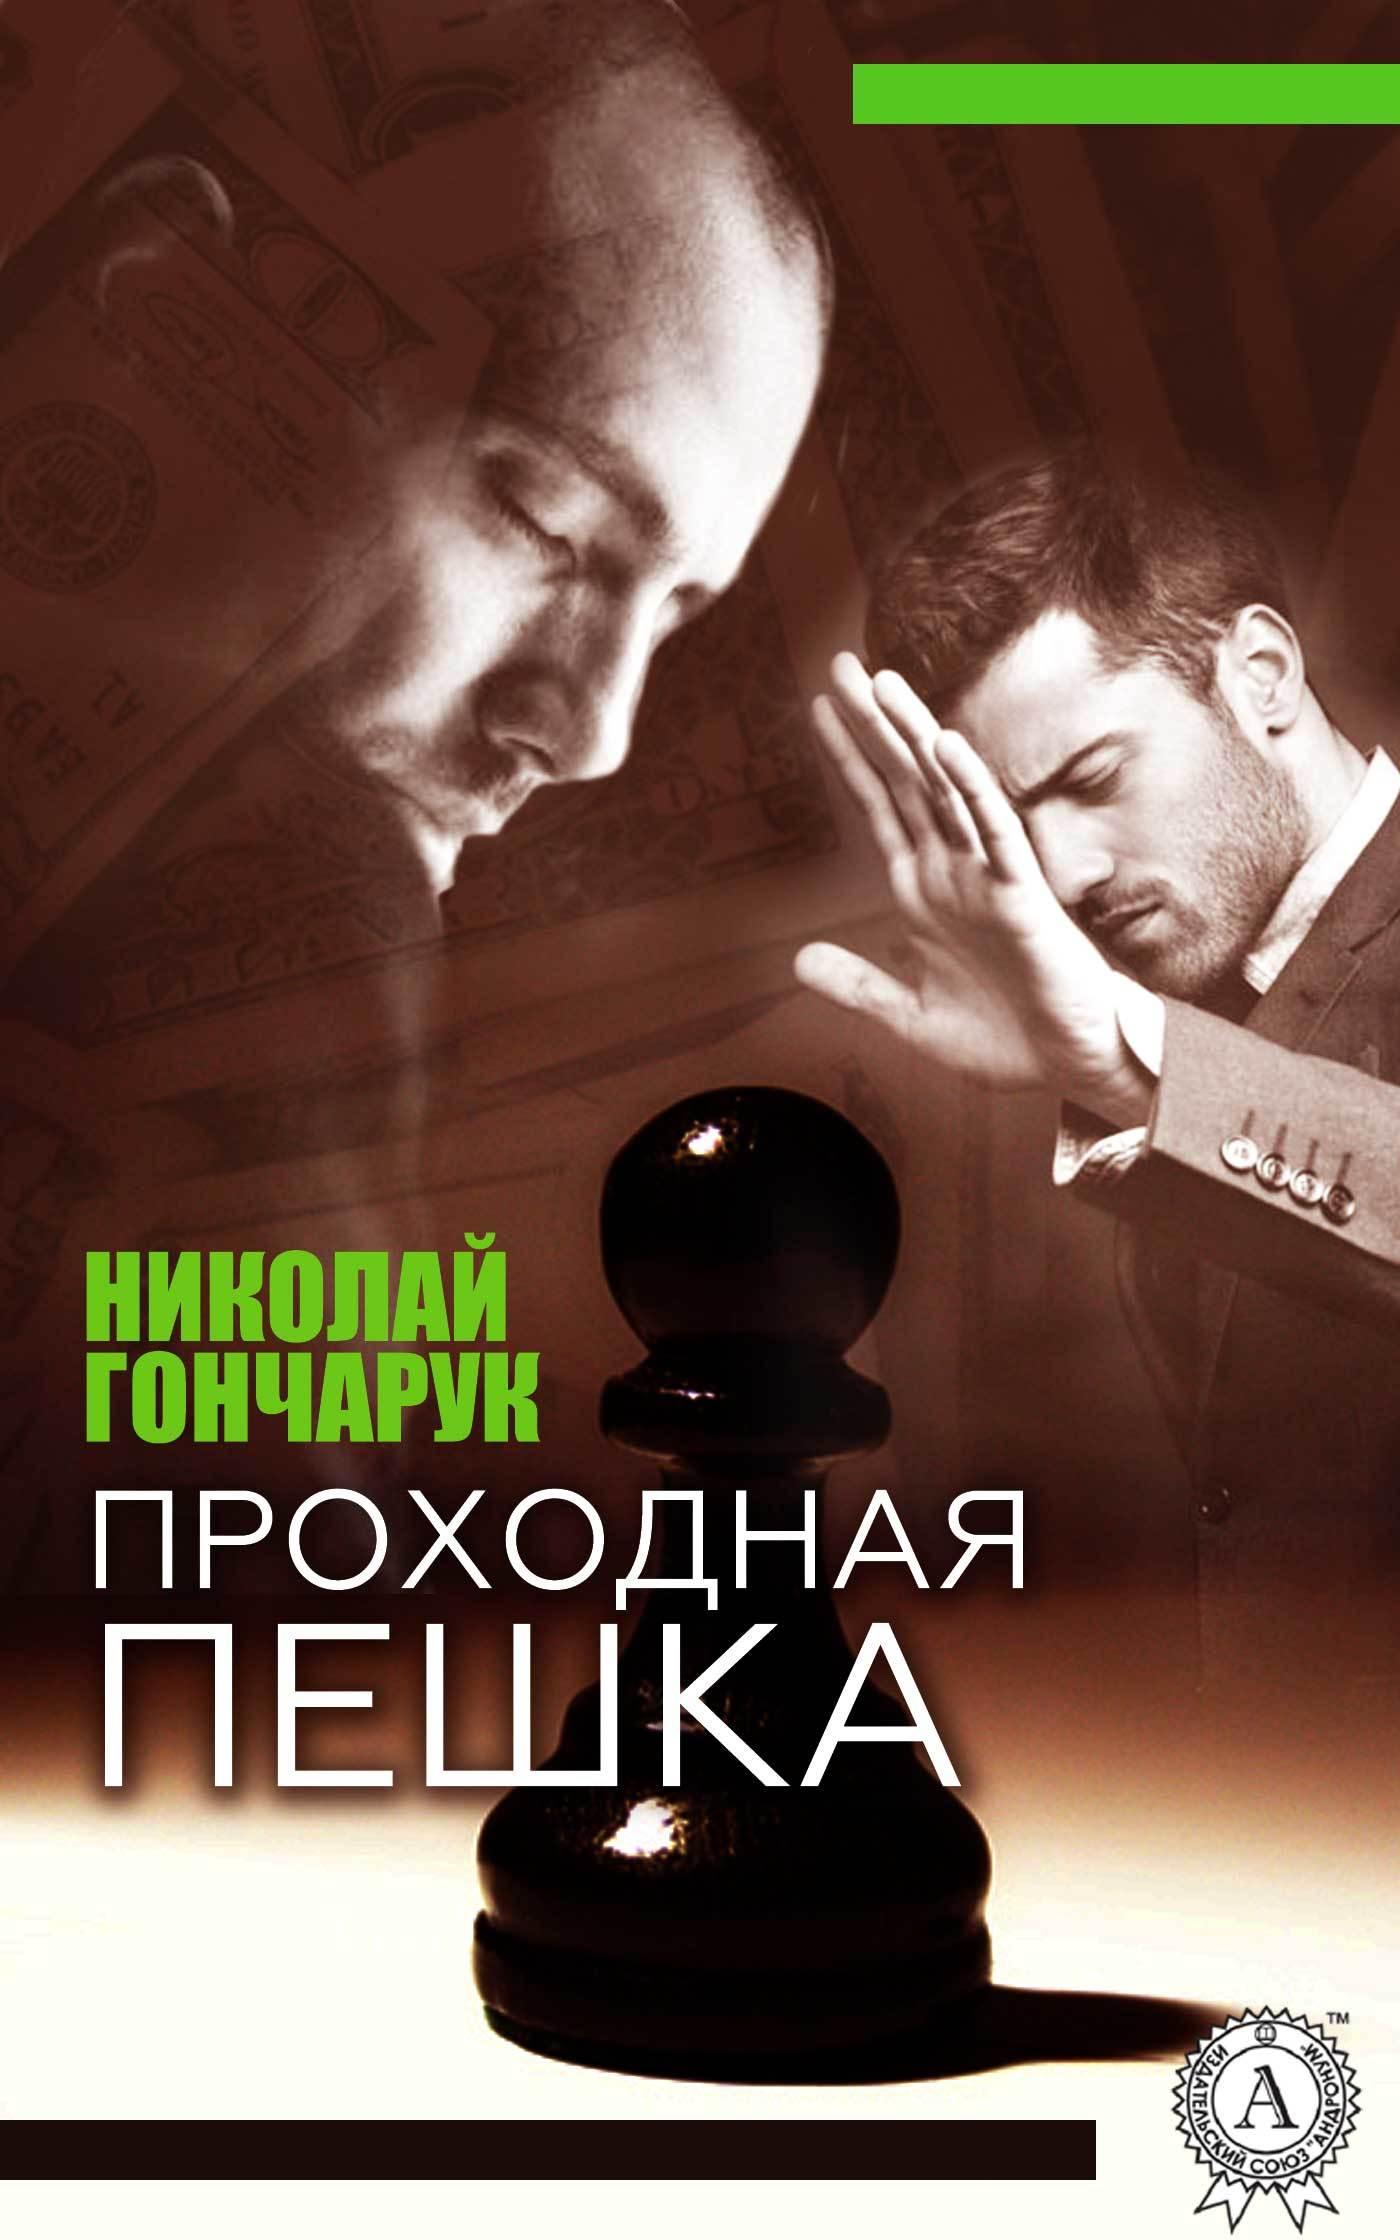 Николай Гончарук Проходная пешка курсанина наталия леонидовна игра не на жизнь проходная пешка